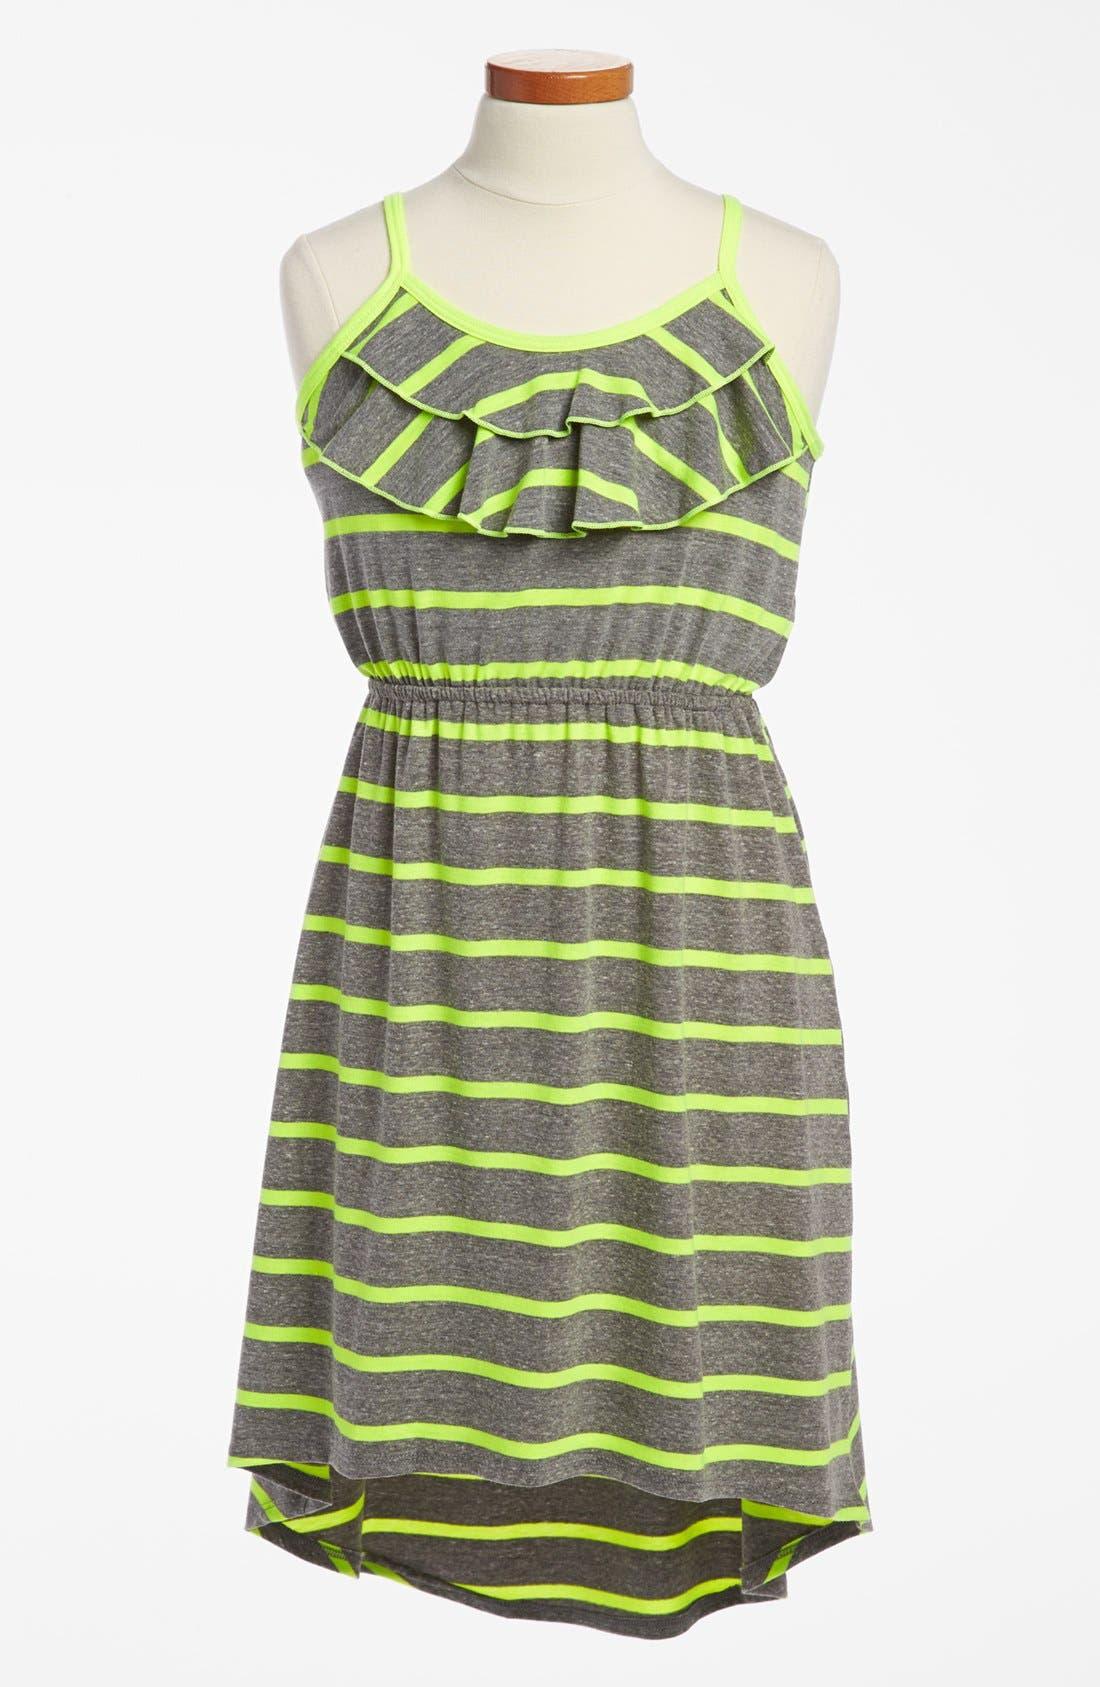 Alternate Image 1 Selected - Soprano 'Deana' High/Low Dress (Big Girls)